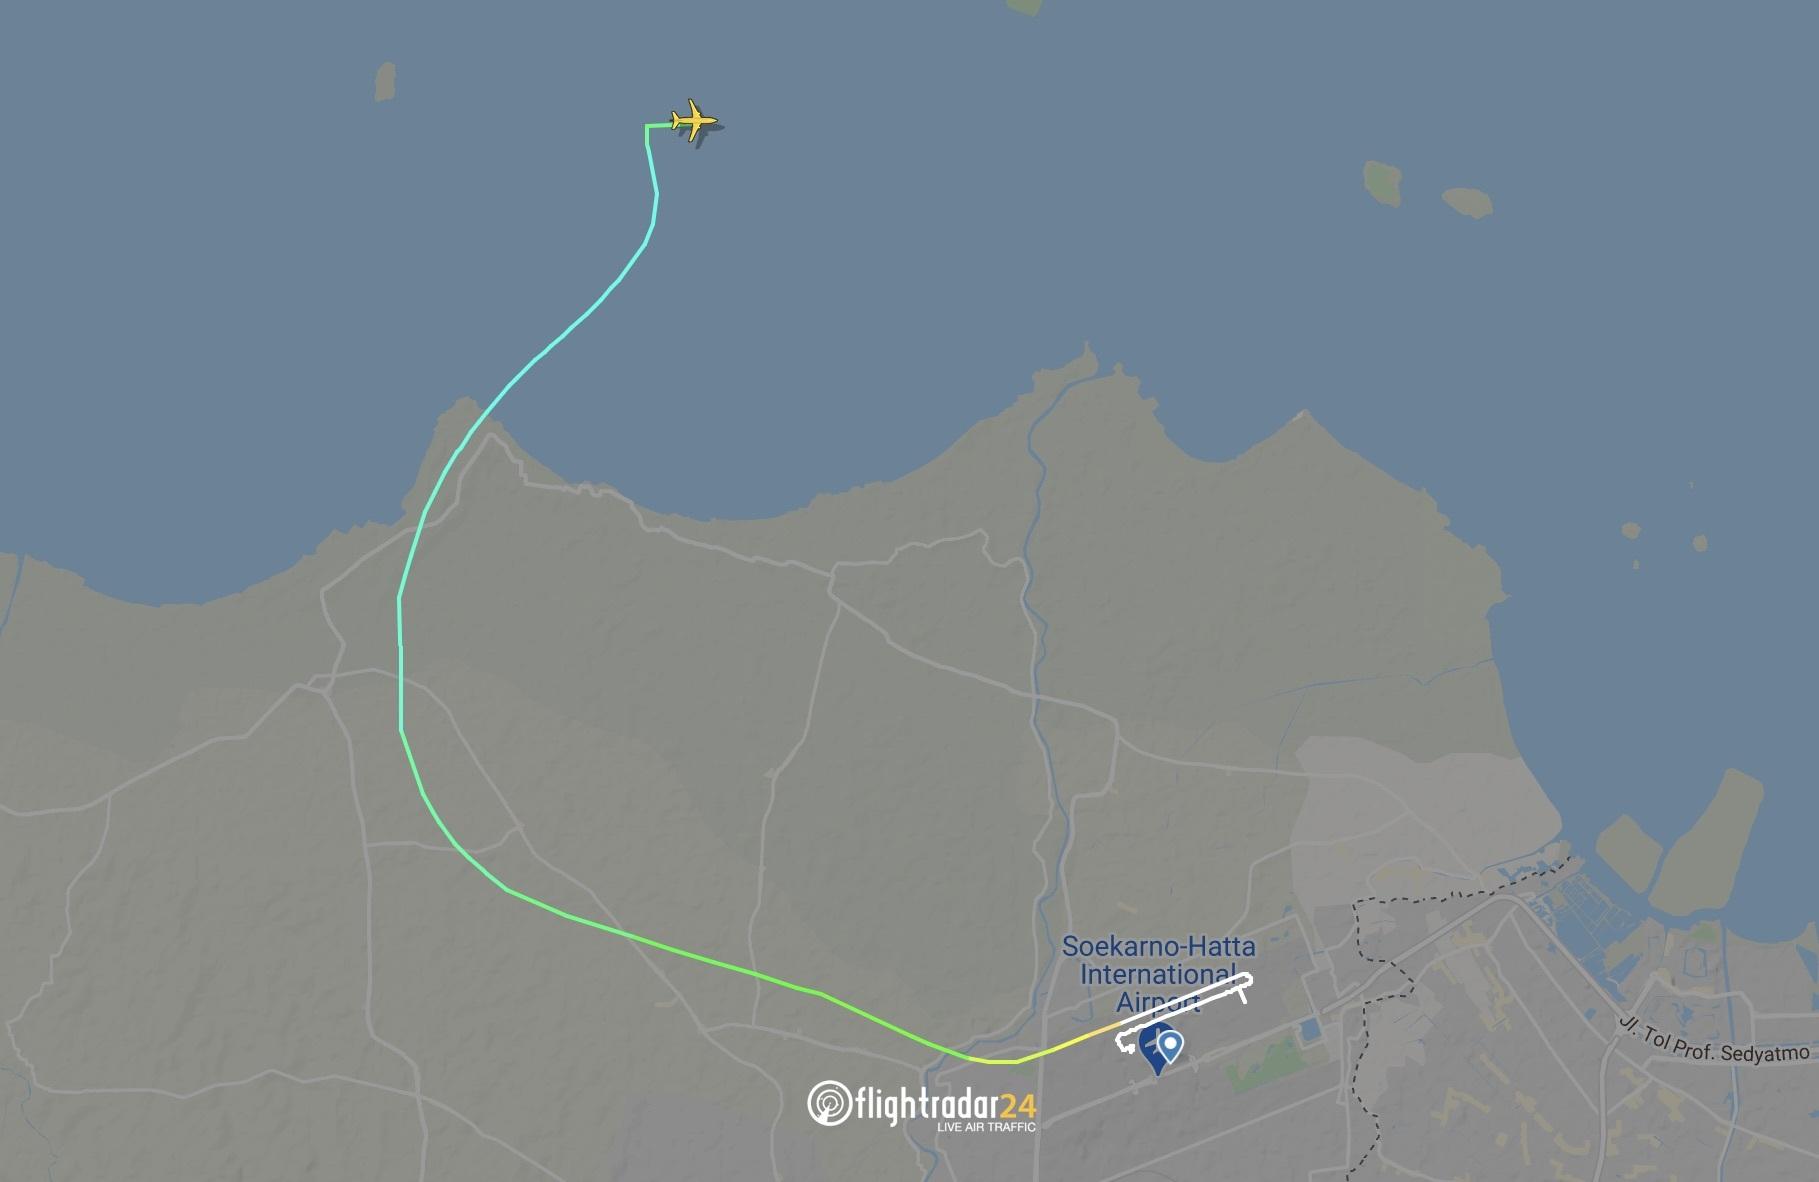 Flight path of SJ182